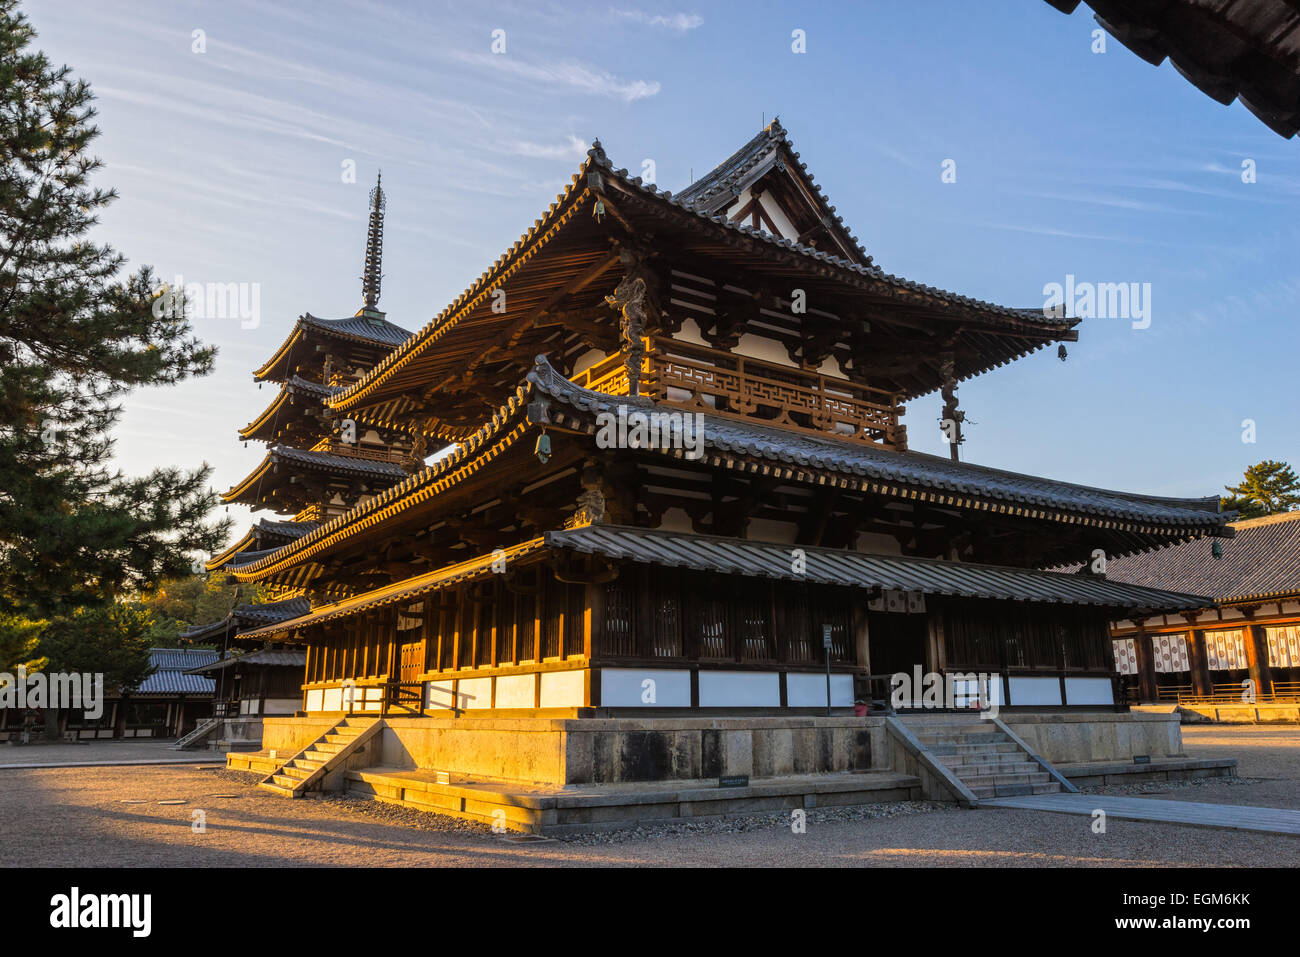 Horyu-ji Temple in Nara, Unesco world Heritage site, Japan - Stock Image